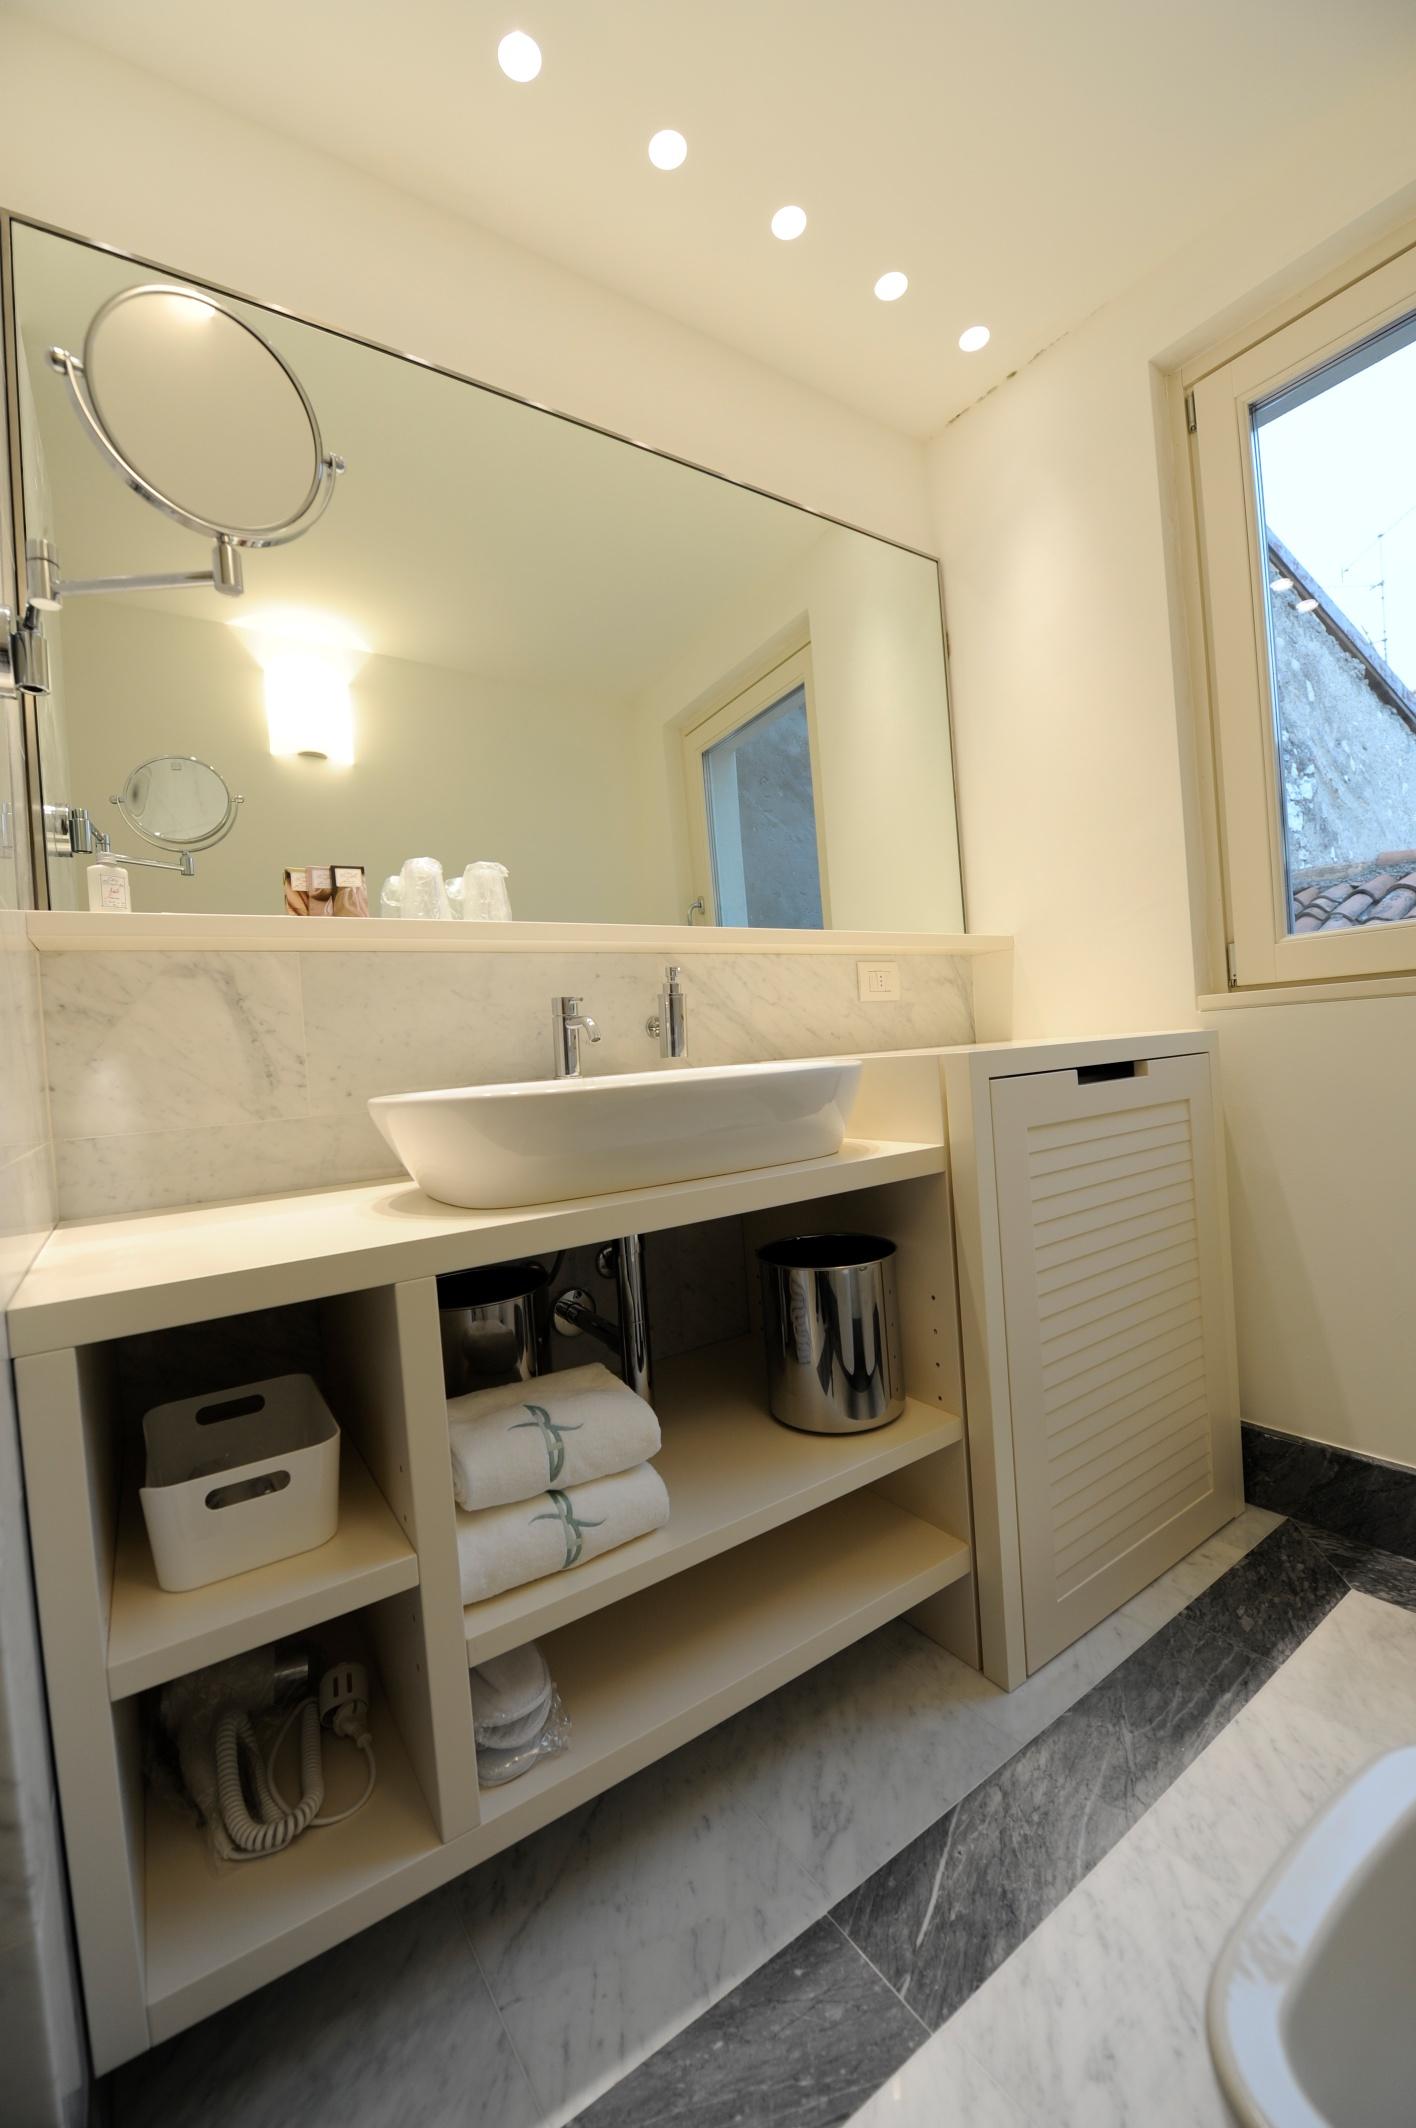 Aparthotel, Casa vacanze, Suite, Boutique Hotel Iseo